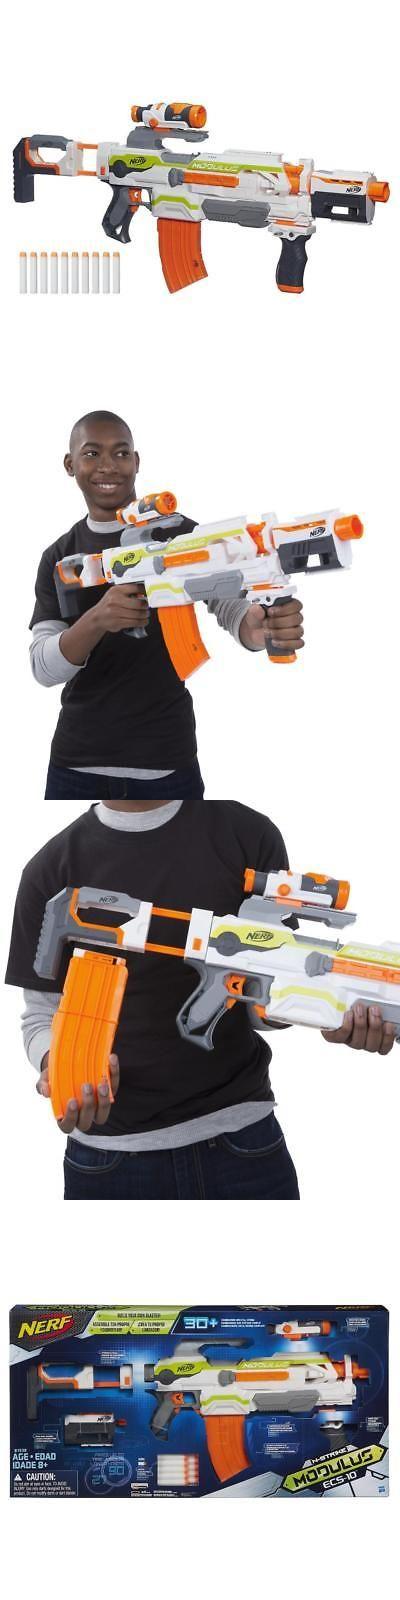 Dart Guns and Soft Darts 158749: Nerf N-Strike Modulus Ecs-10 Blaster -> BUY IT NOW ONLY: $49.99 on eBay!